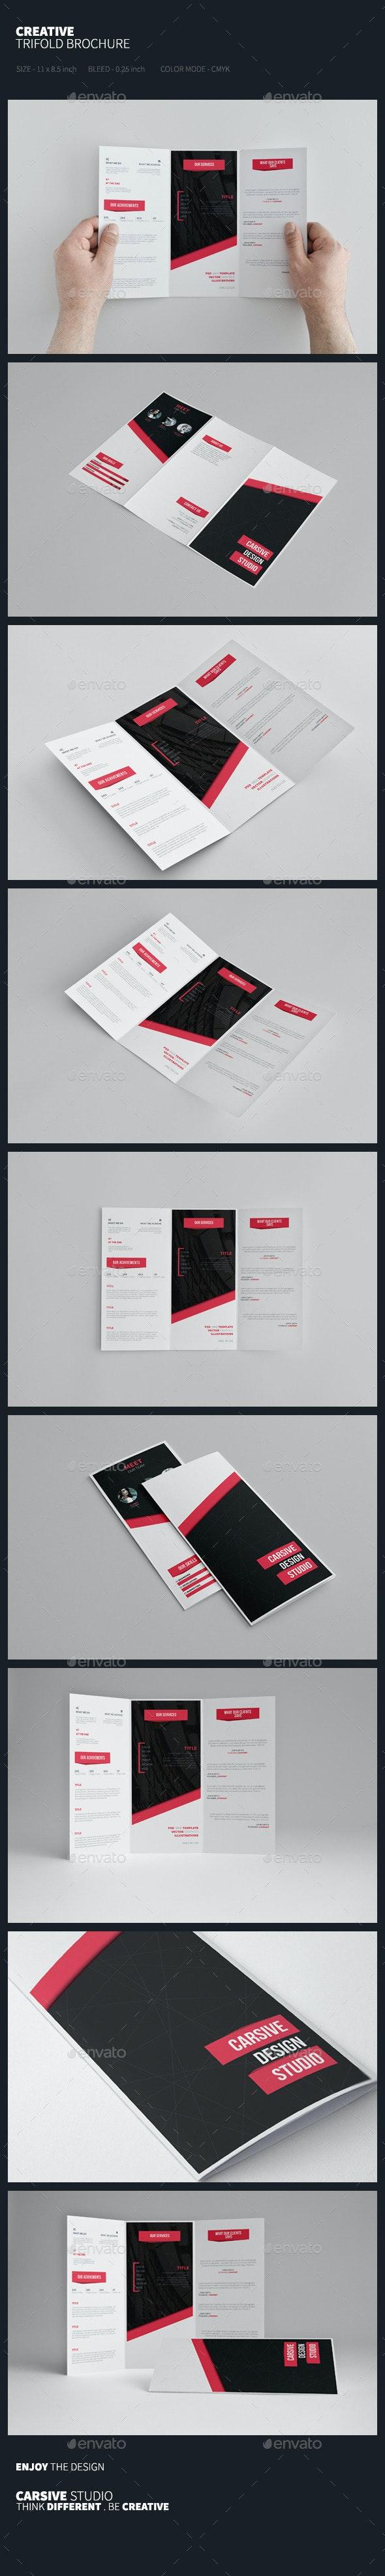 Creative Trifold Brochure Template - Corporate Brochures